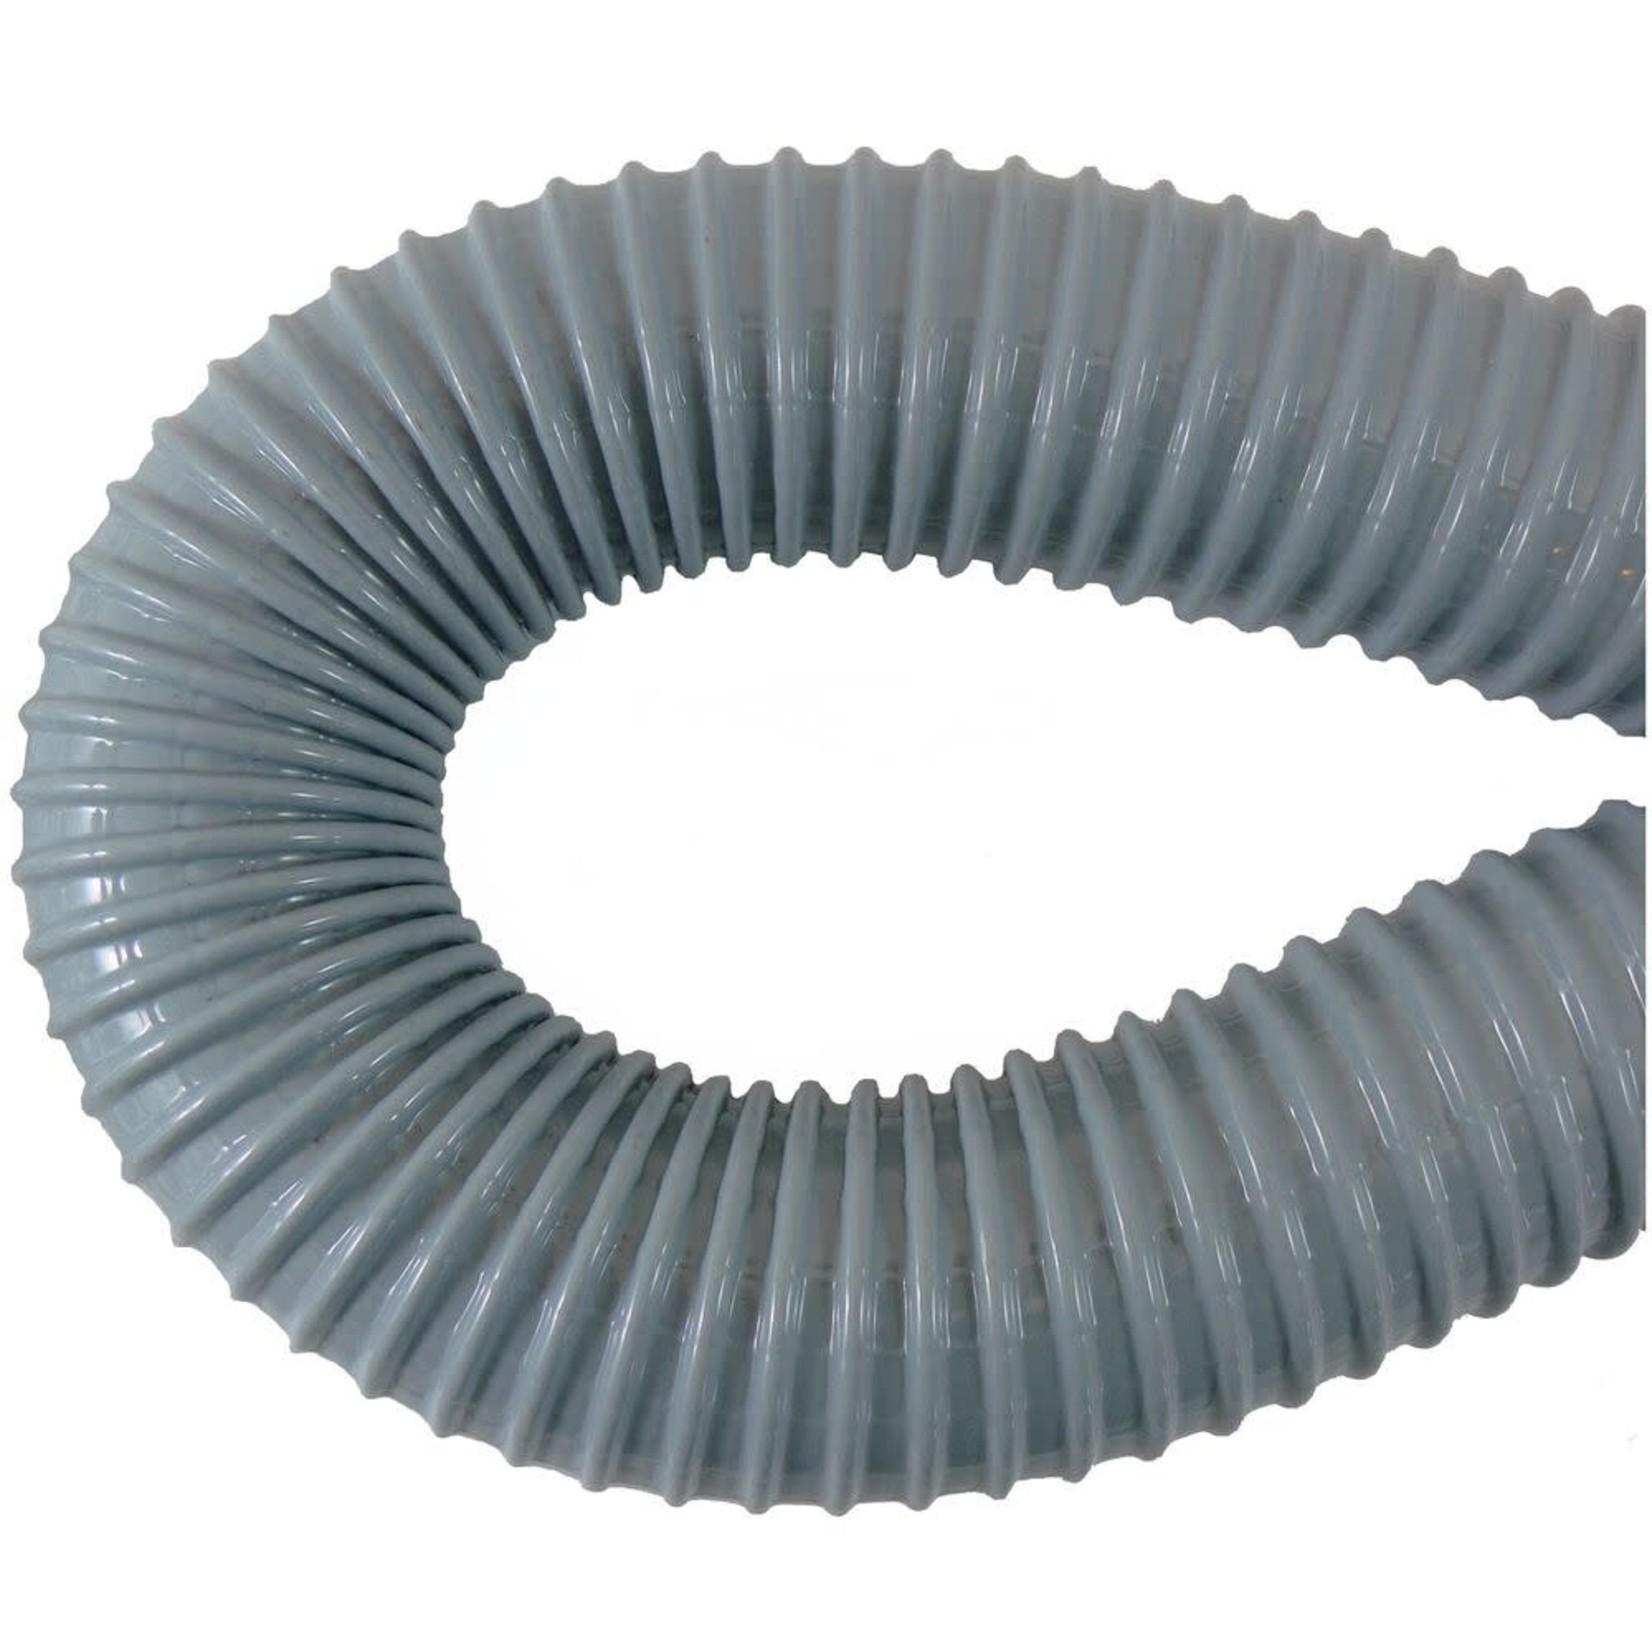 "Plastiflex Copy of CVS 2"" Flex Pipe - Box of 50'"